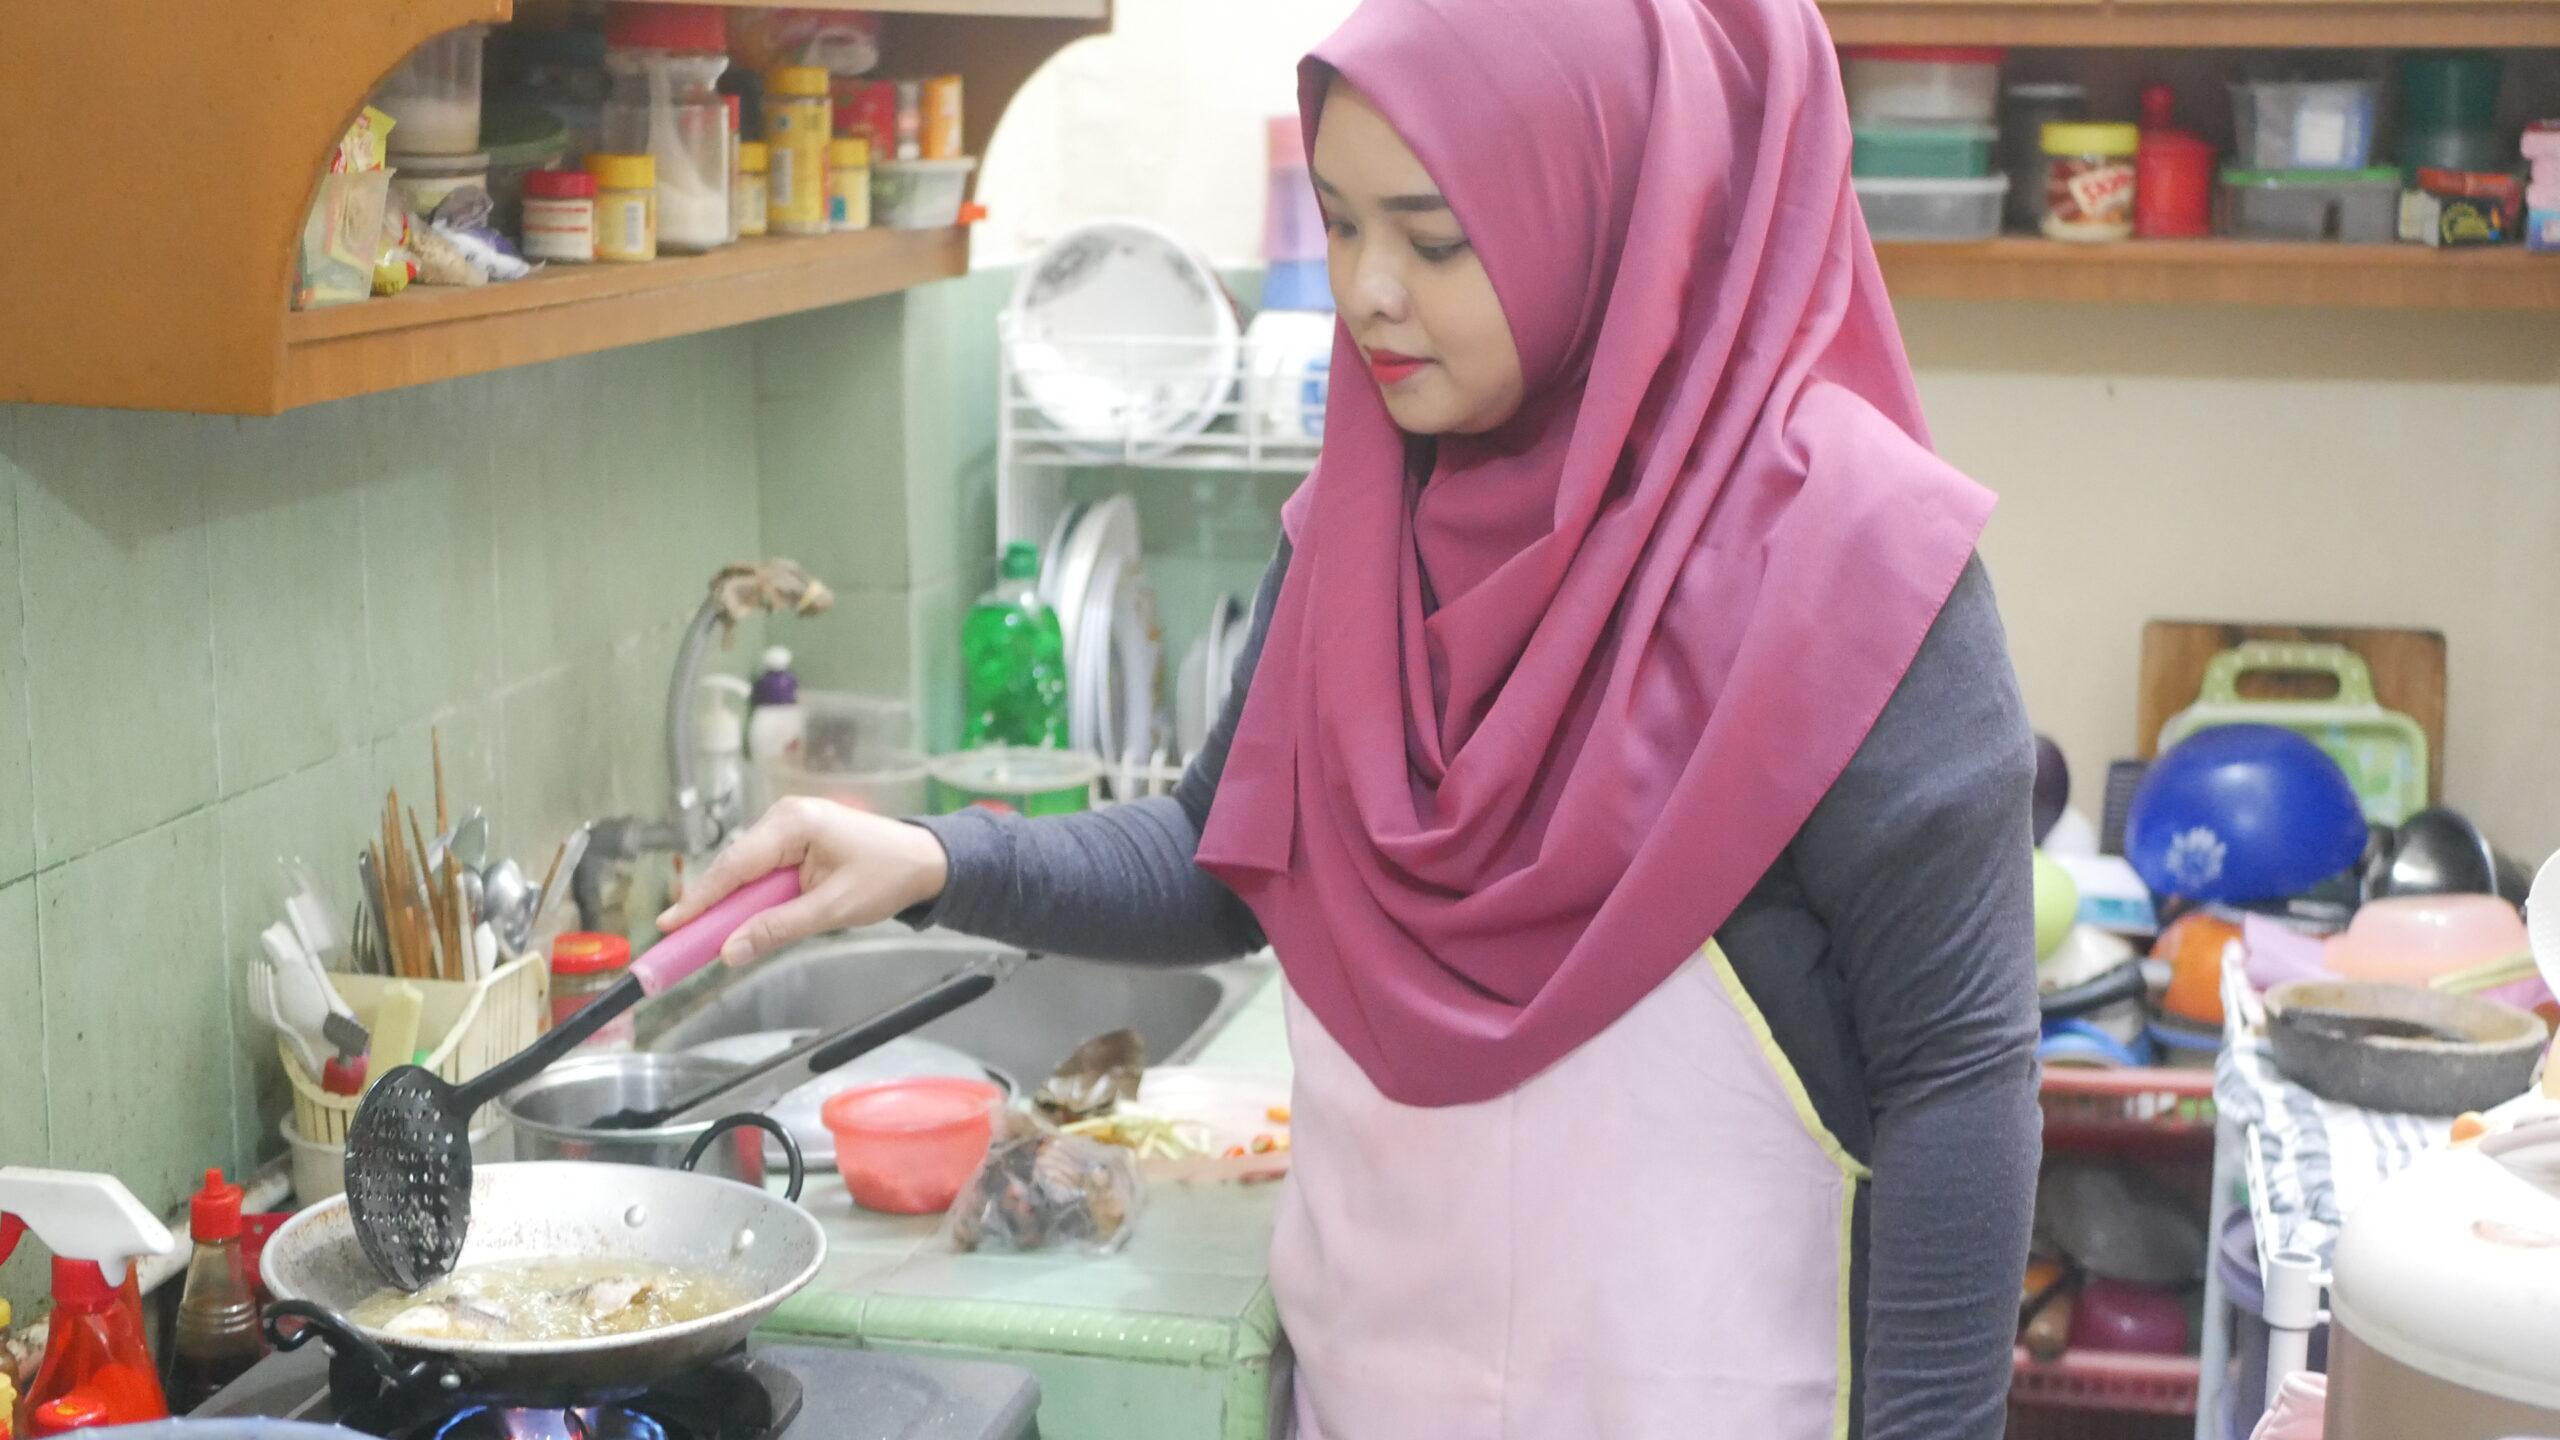 Oline memasak saat WFH